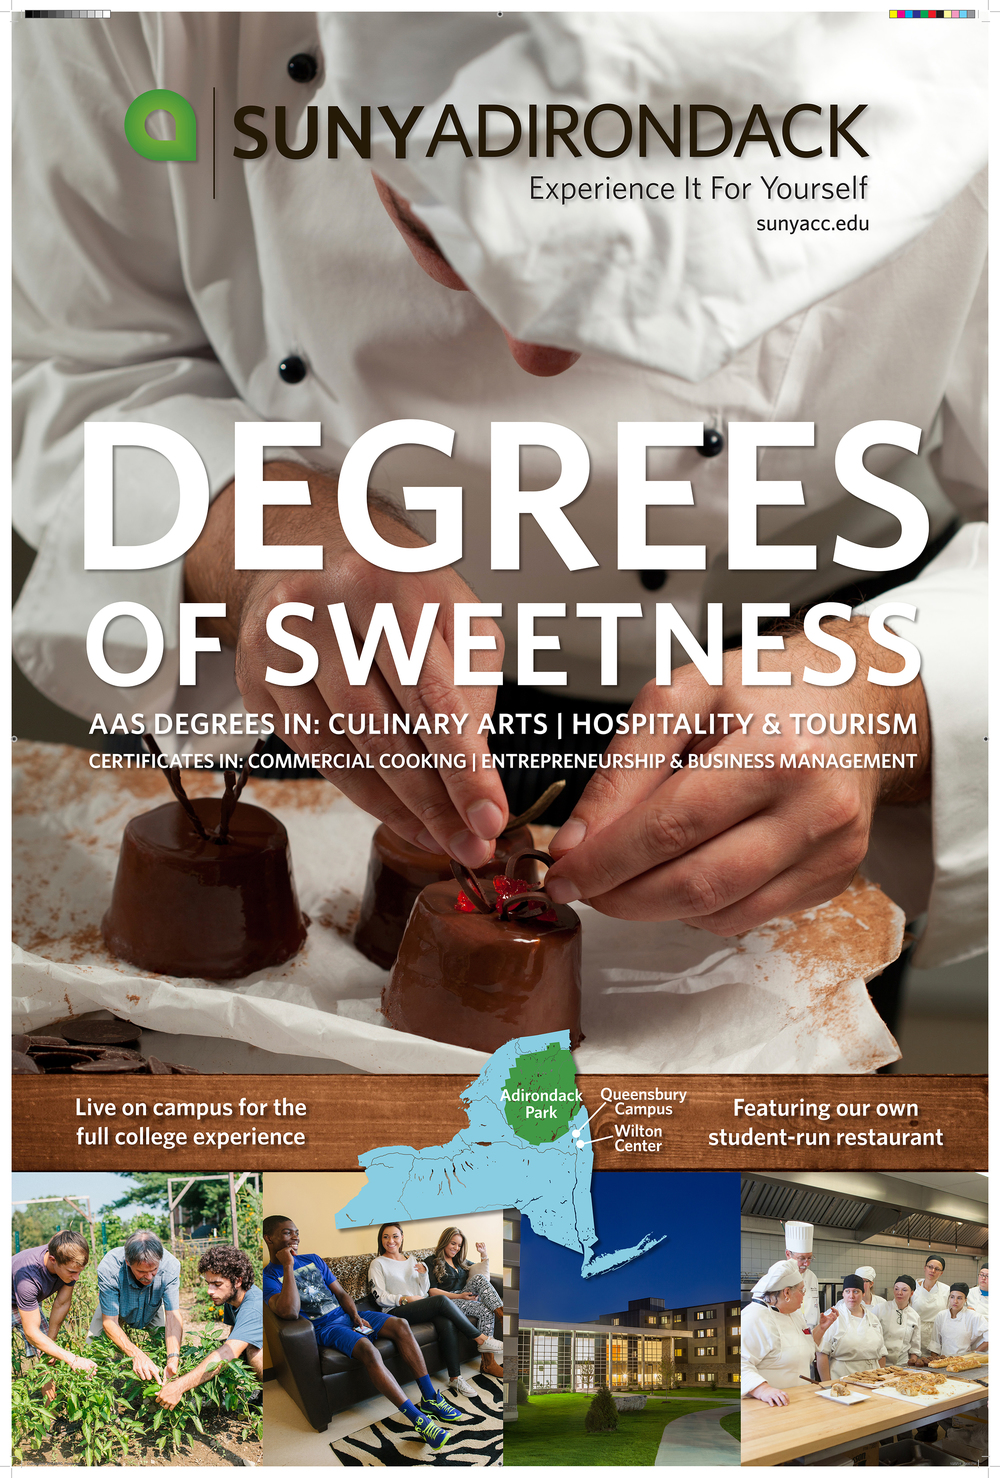 CulinaryArts_WWAARC_Poster.jpg